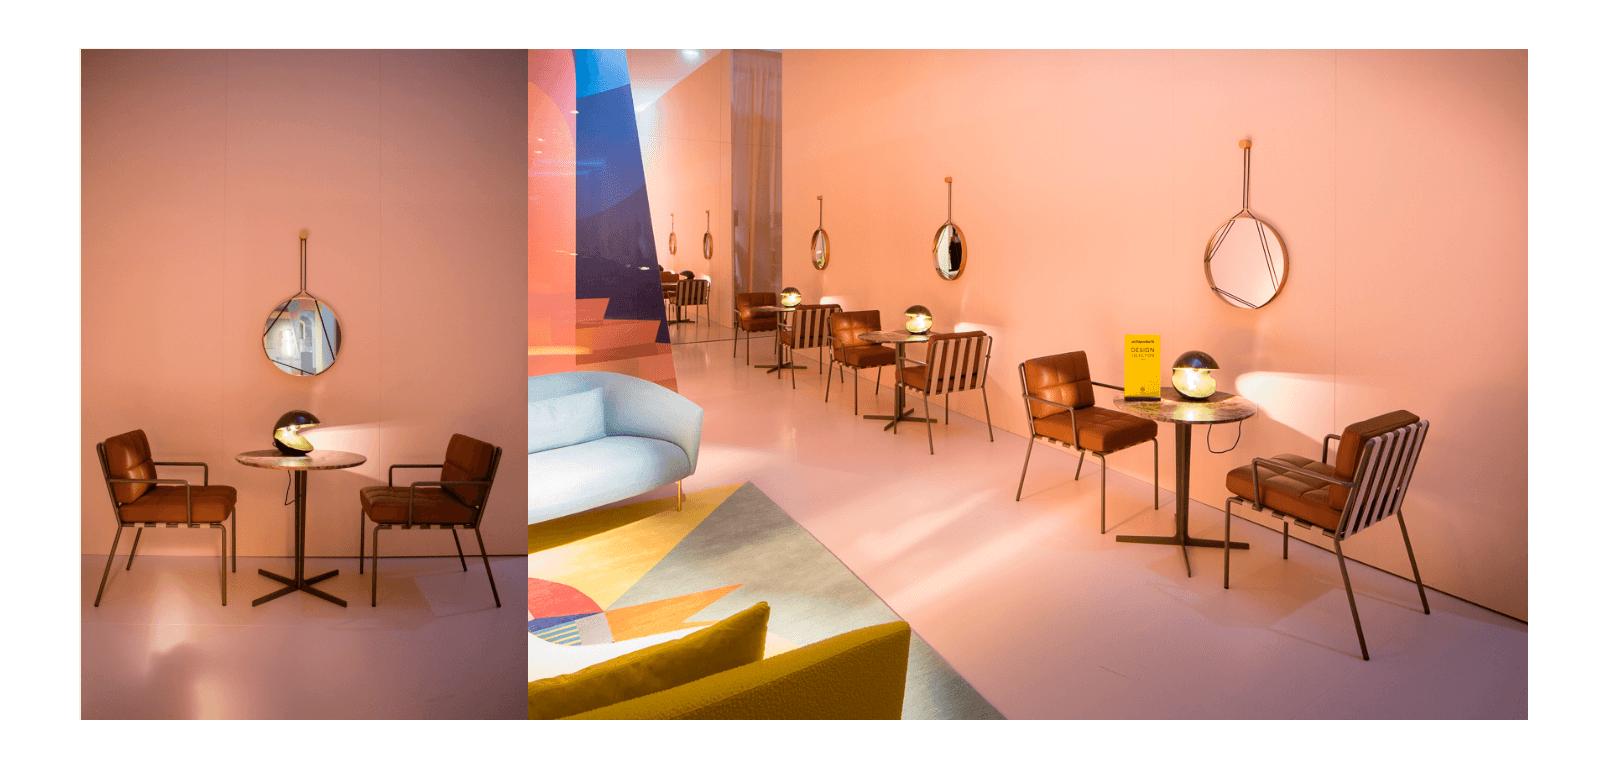 tacchini italia julep nouveautes milan 2018 silvera. Black Bedroom Furniture Sets. Home Design Ideas